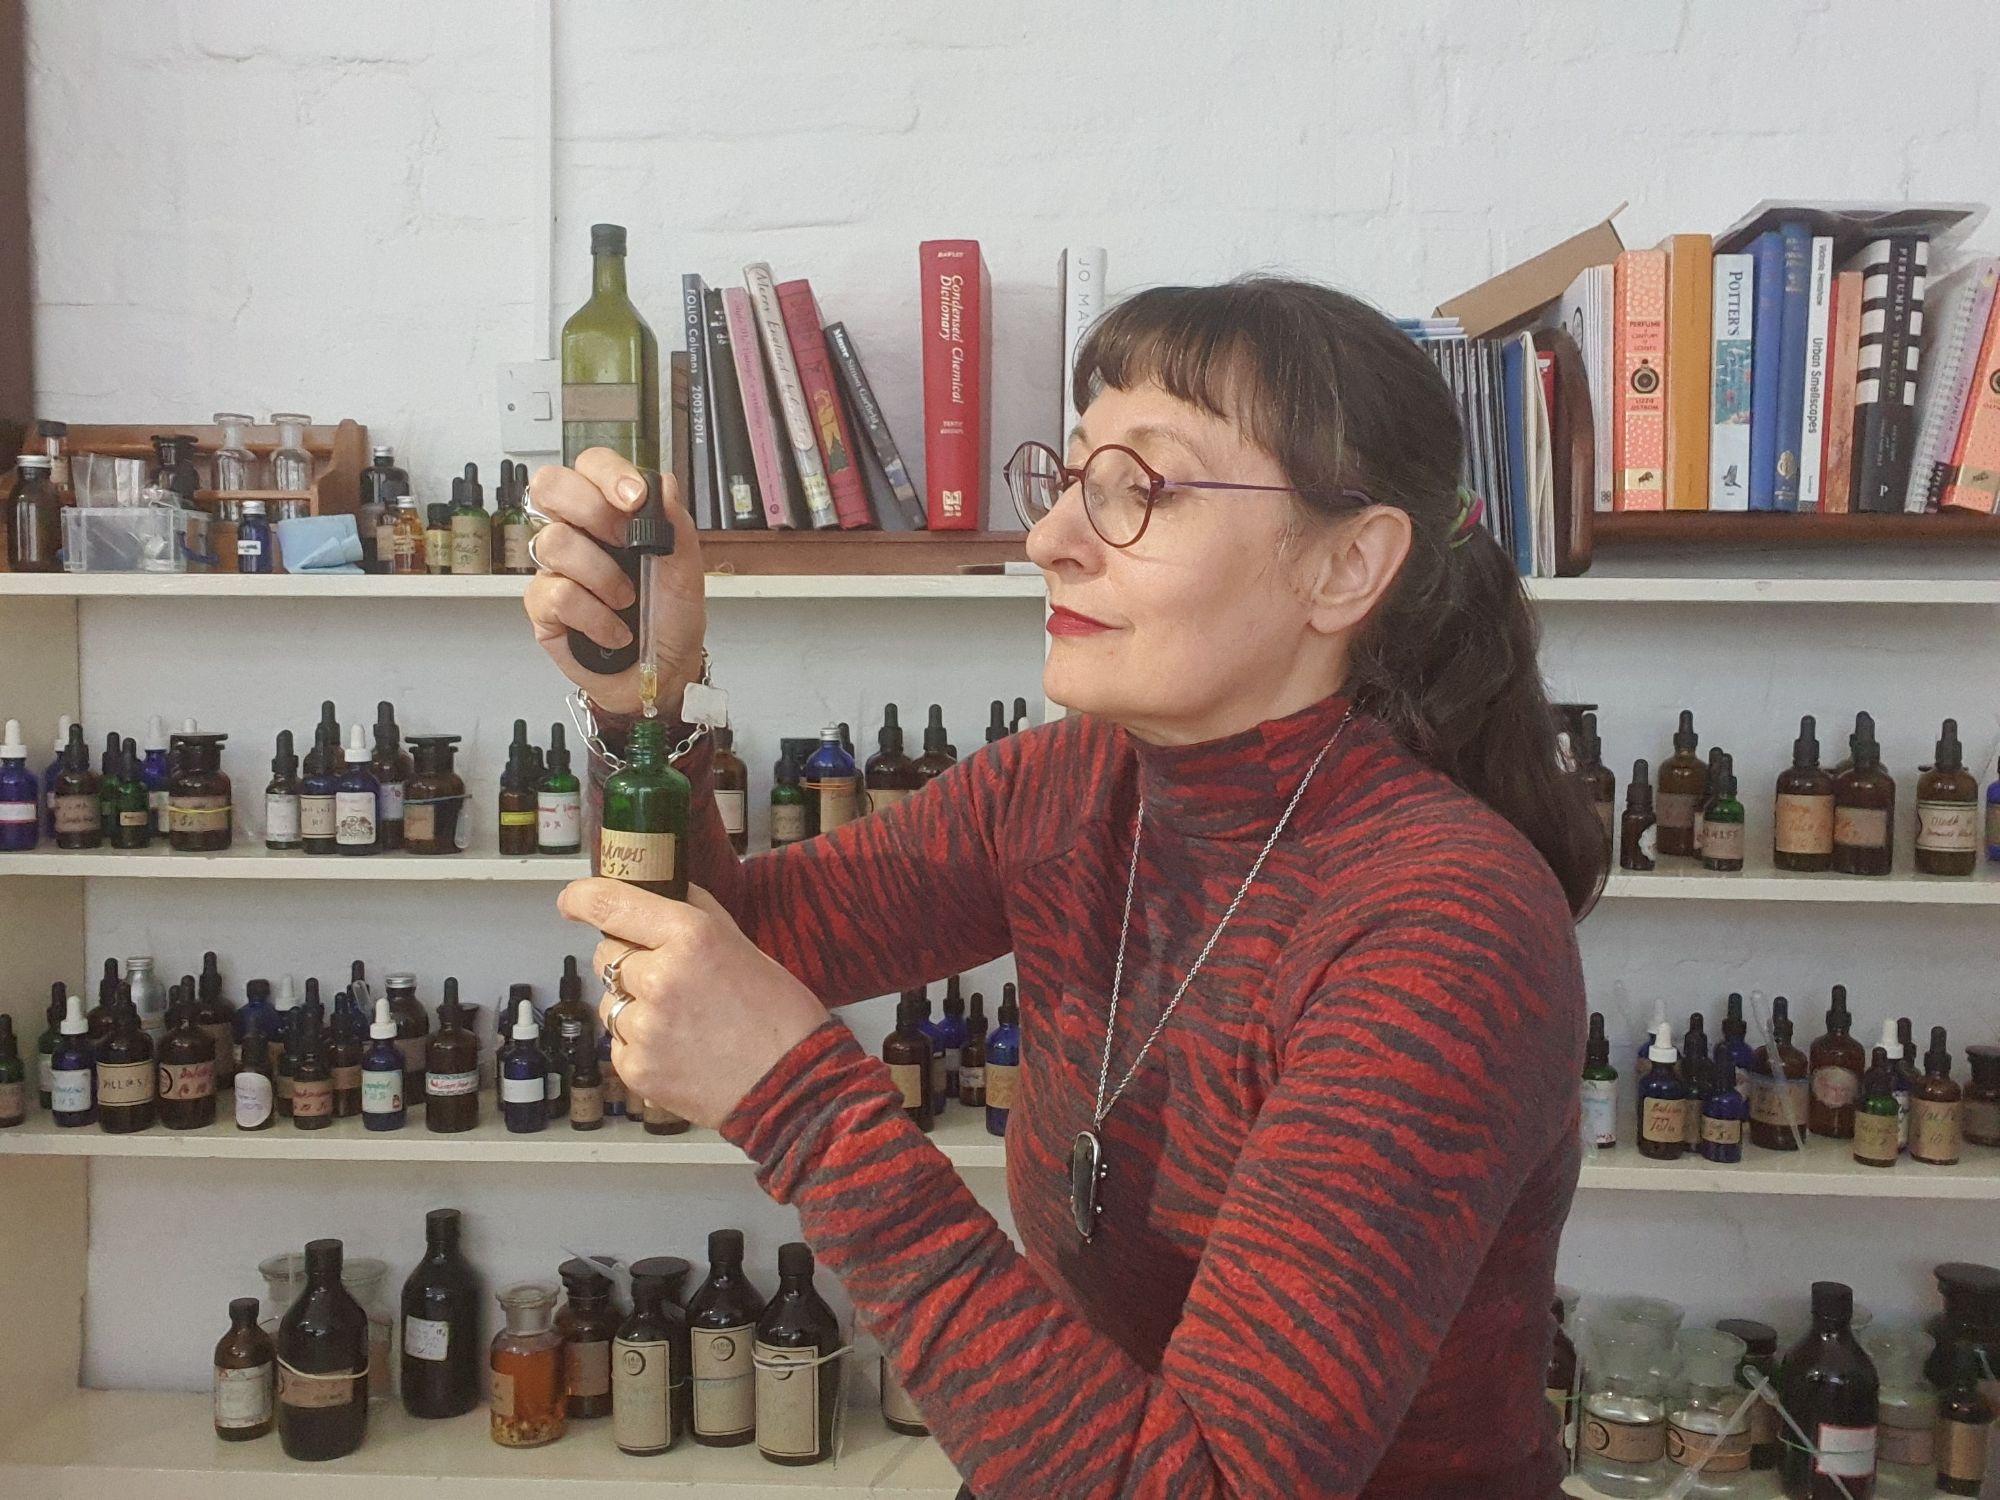 Perfumer Sarah McCartney in front of a shelf full of perfume materials